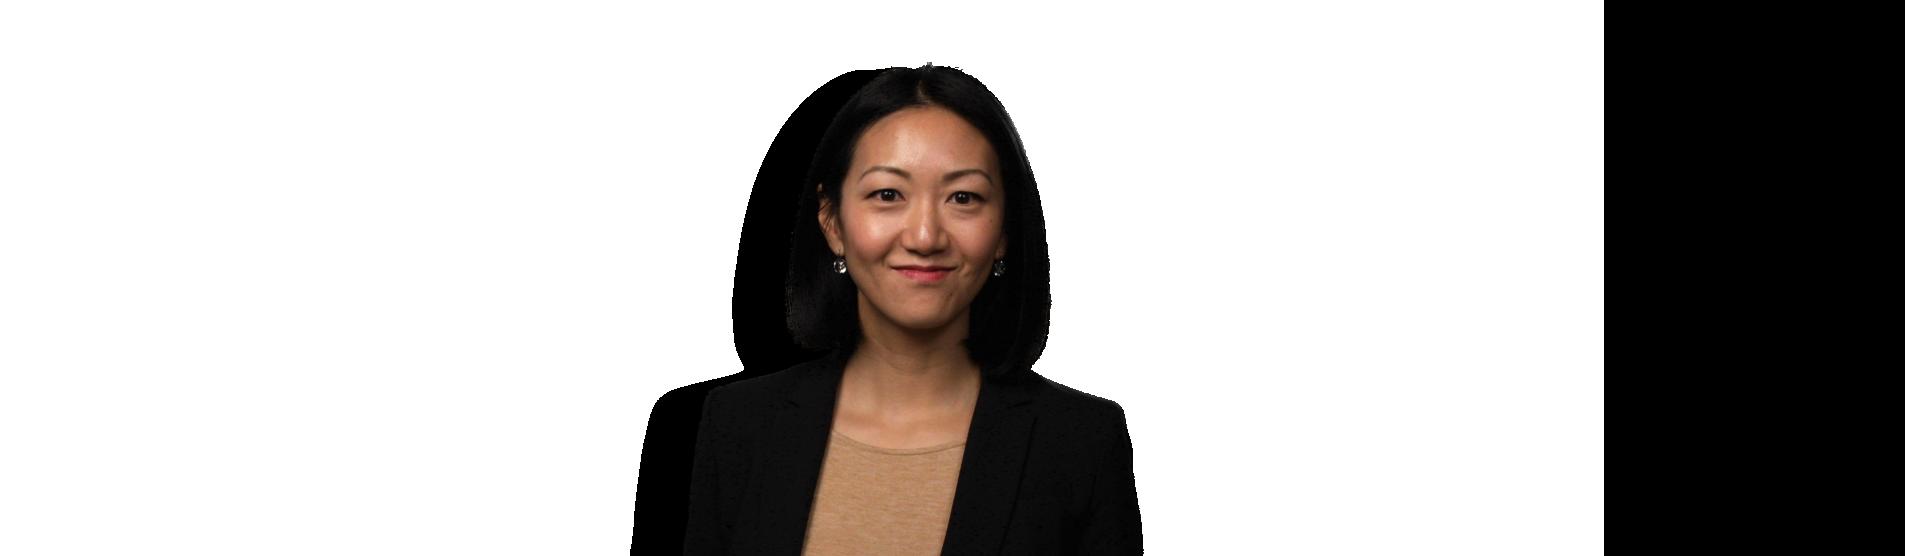 Headshot of Mu Yang